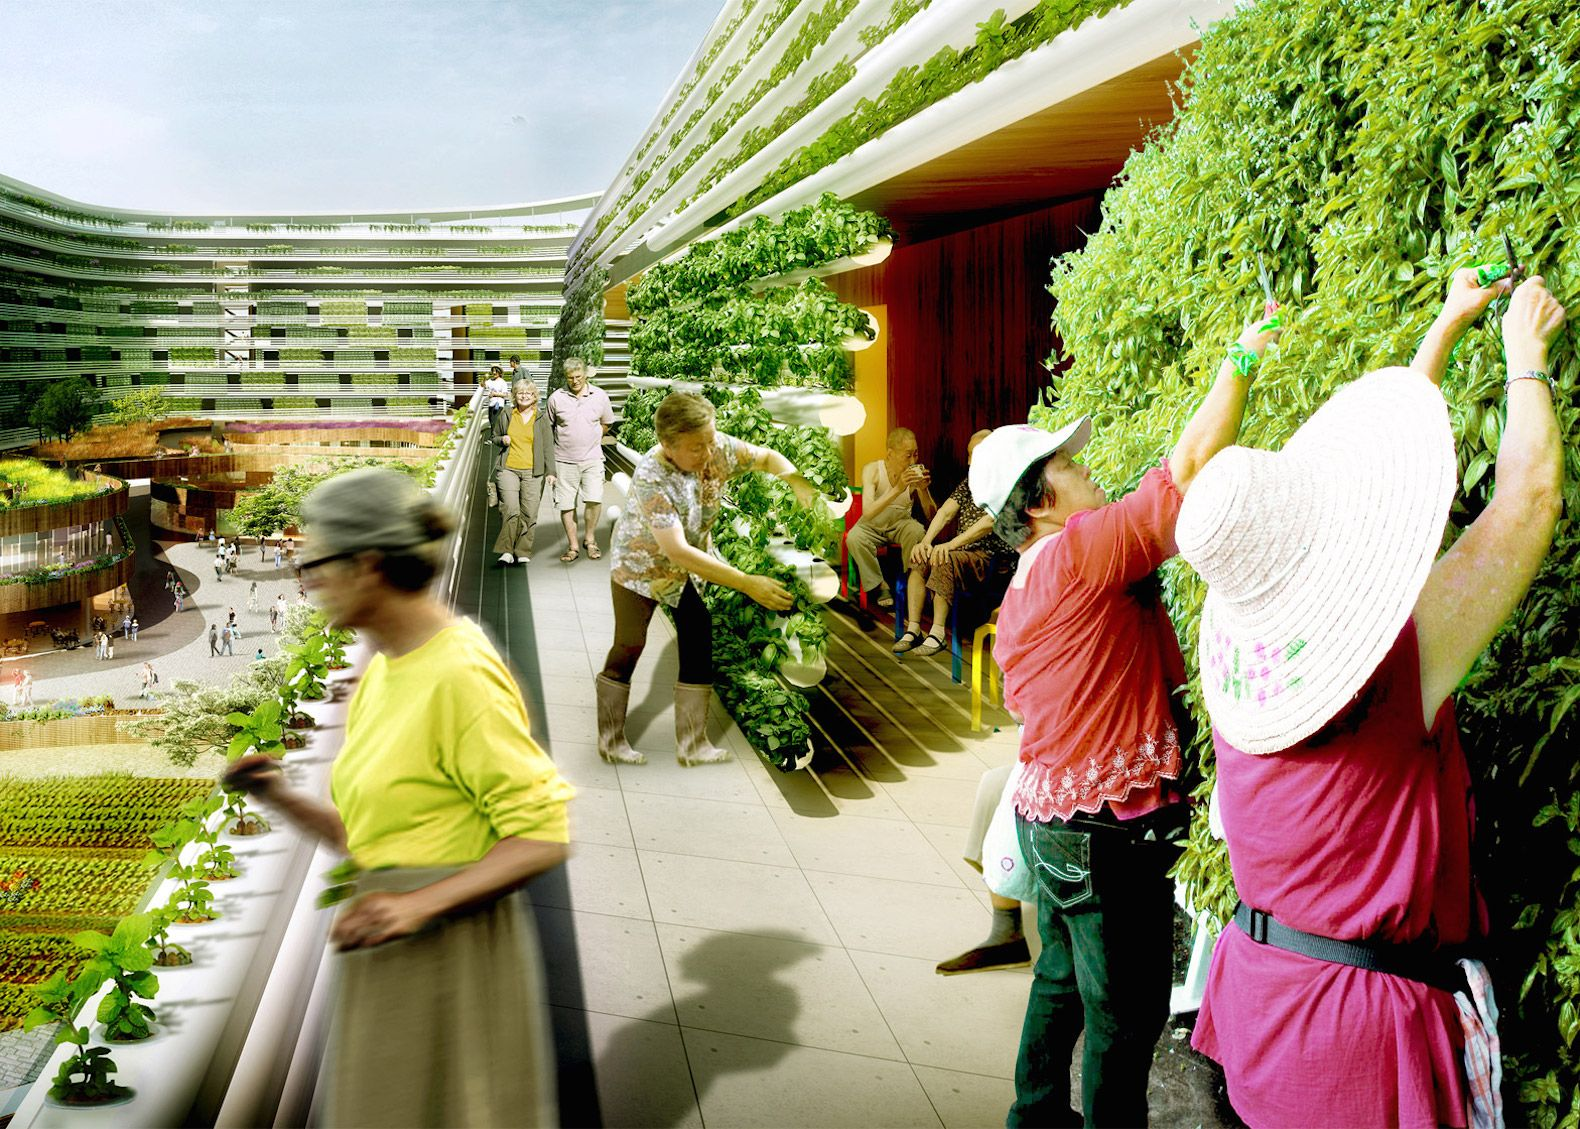 visionary homefarm combines retirement homes and vertical urban